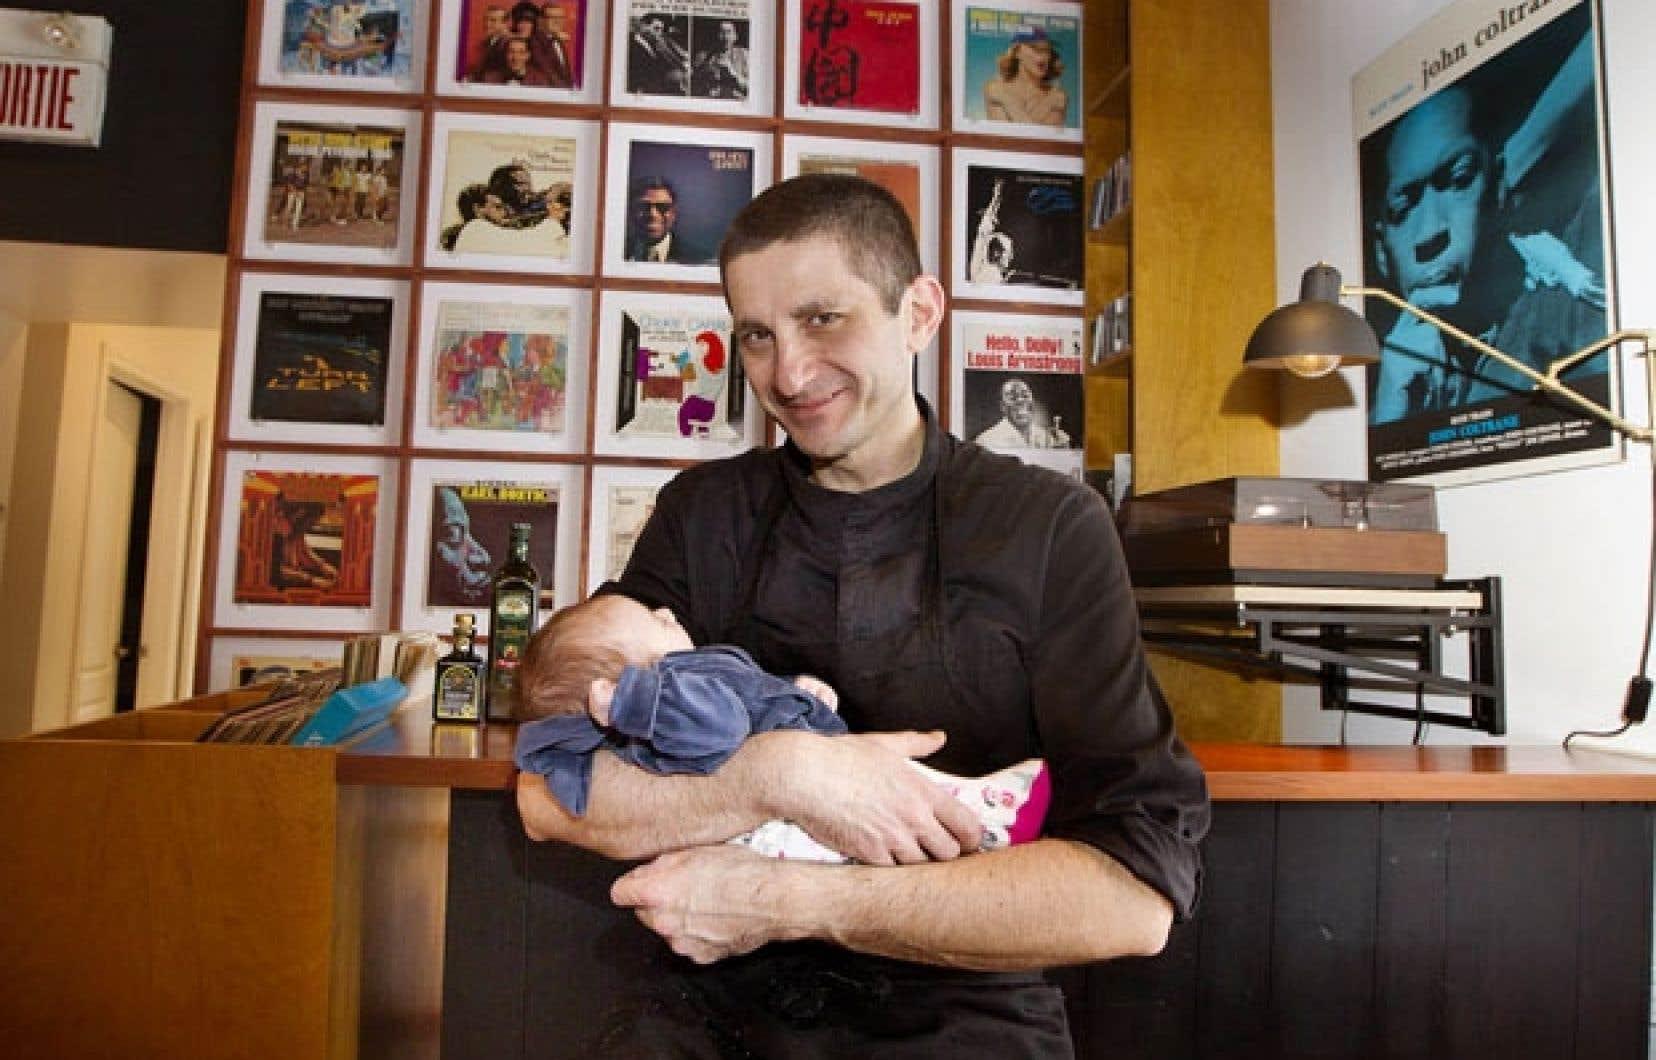 Le chef propriétaire du restaurant Barcola, Fabrizio Caprioli, et sa petite Stella, un mois.